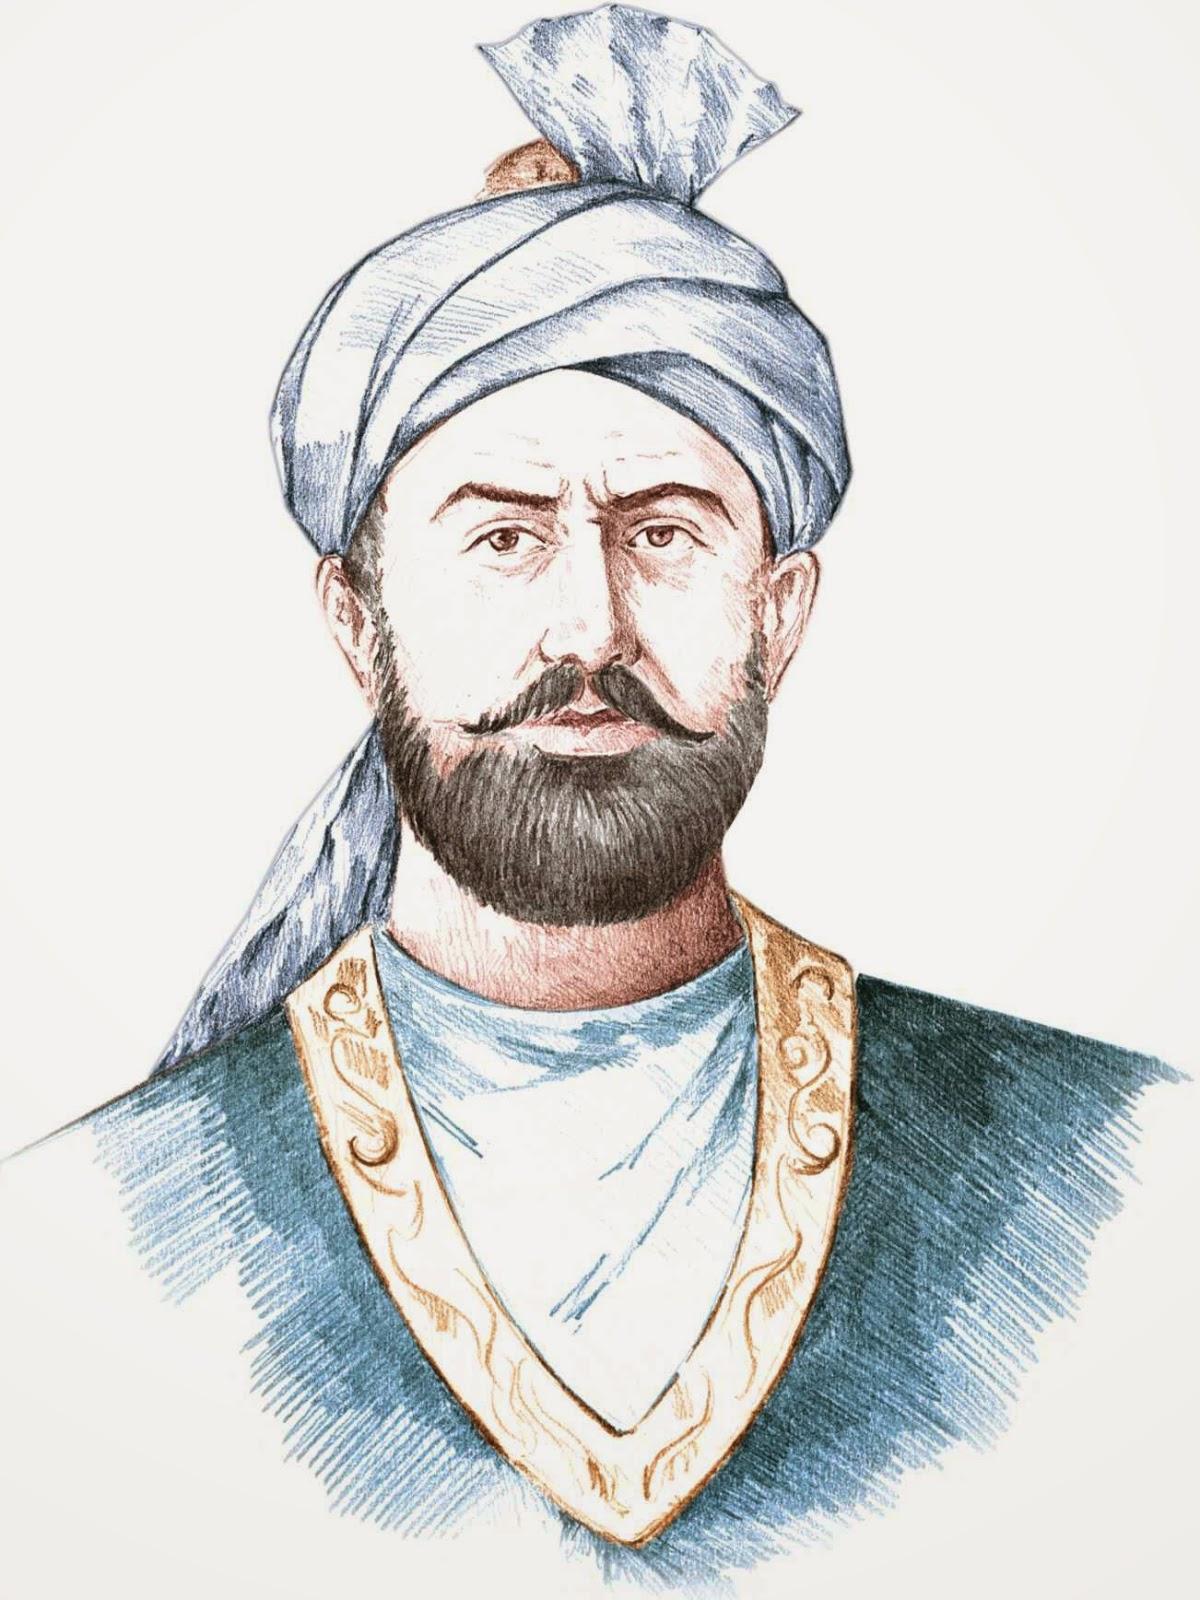 History of Pashtuns: Mir wais Hotak